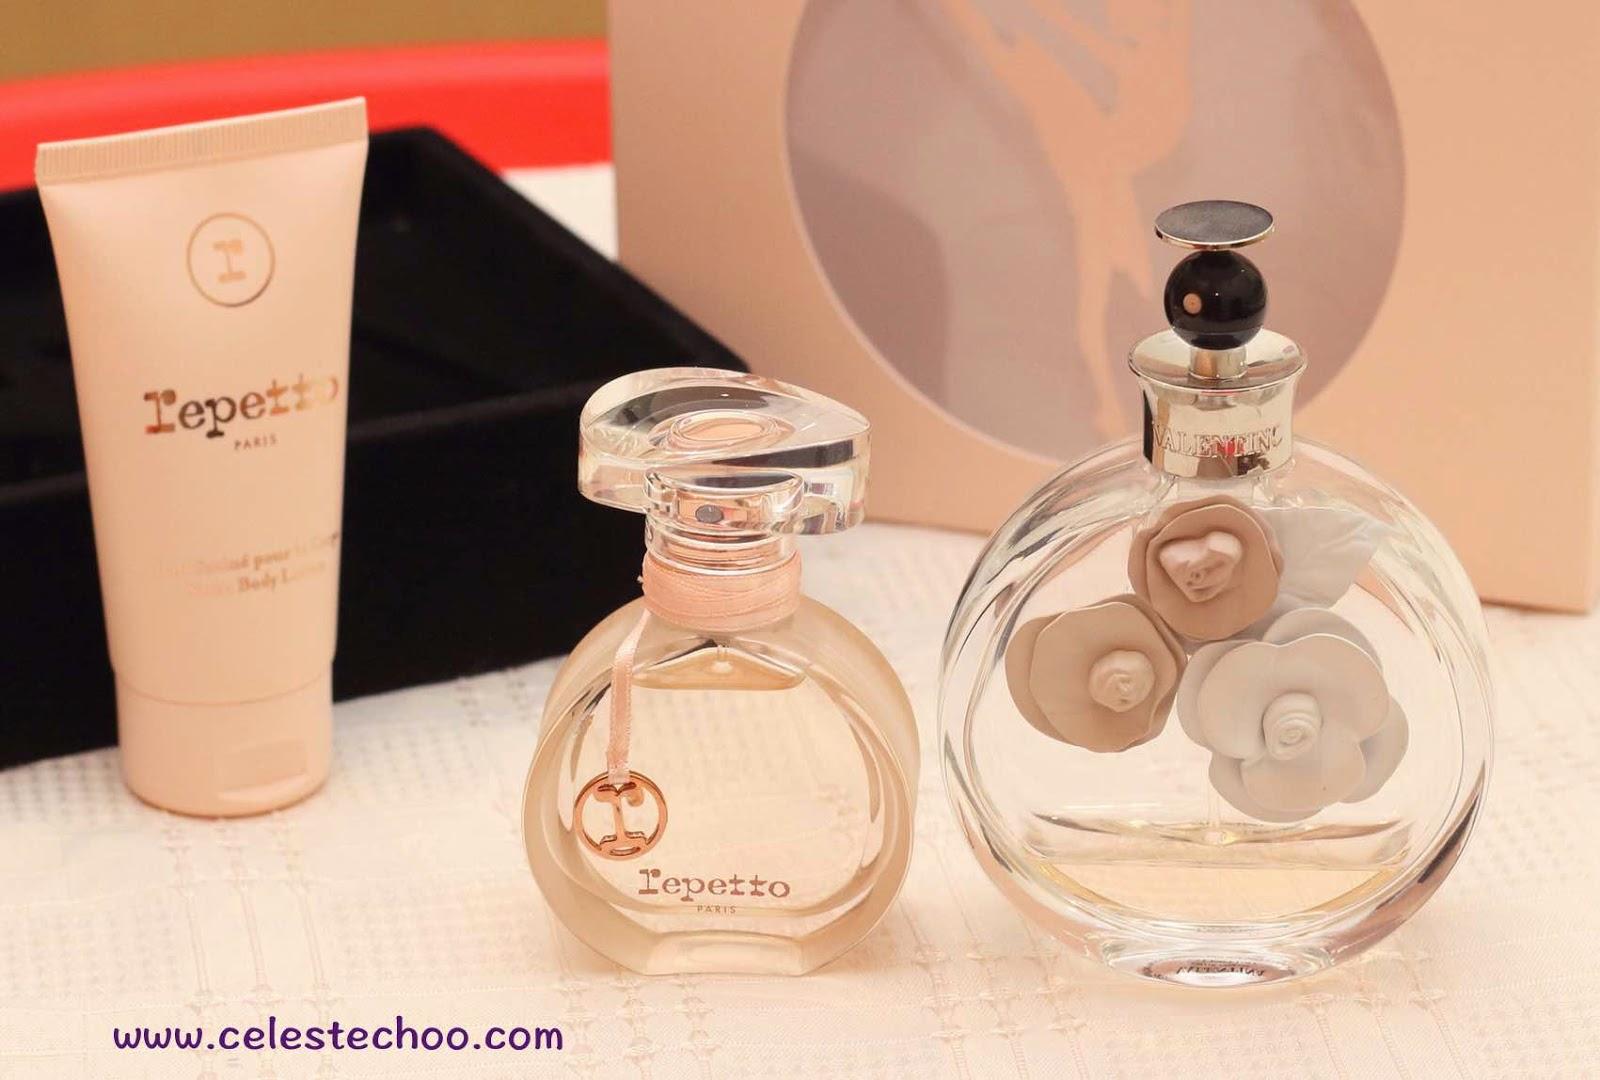 designer-fragrance-repetto-paris-perfume-and-lotion